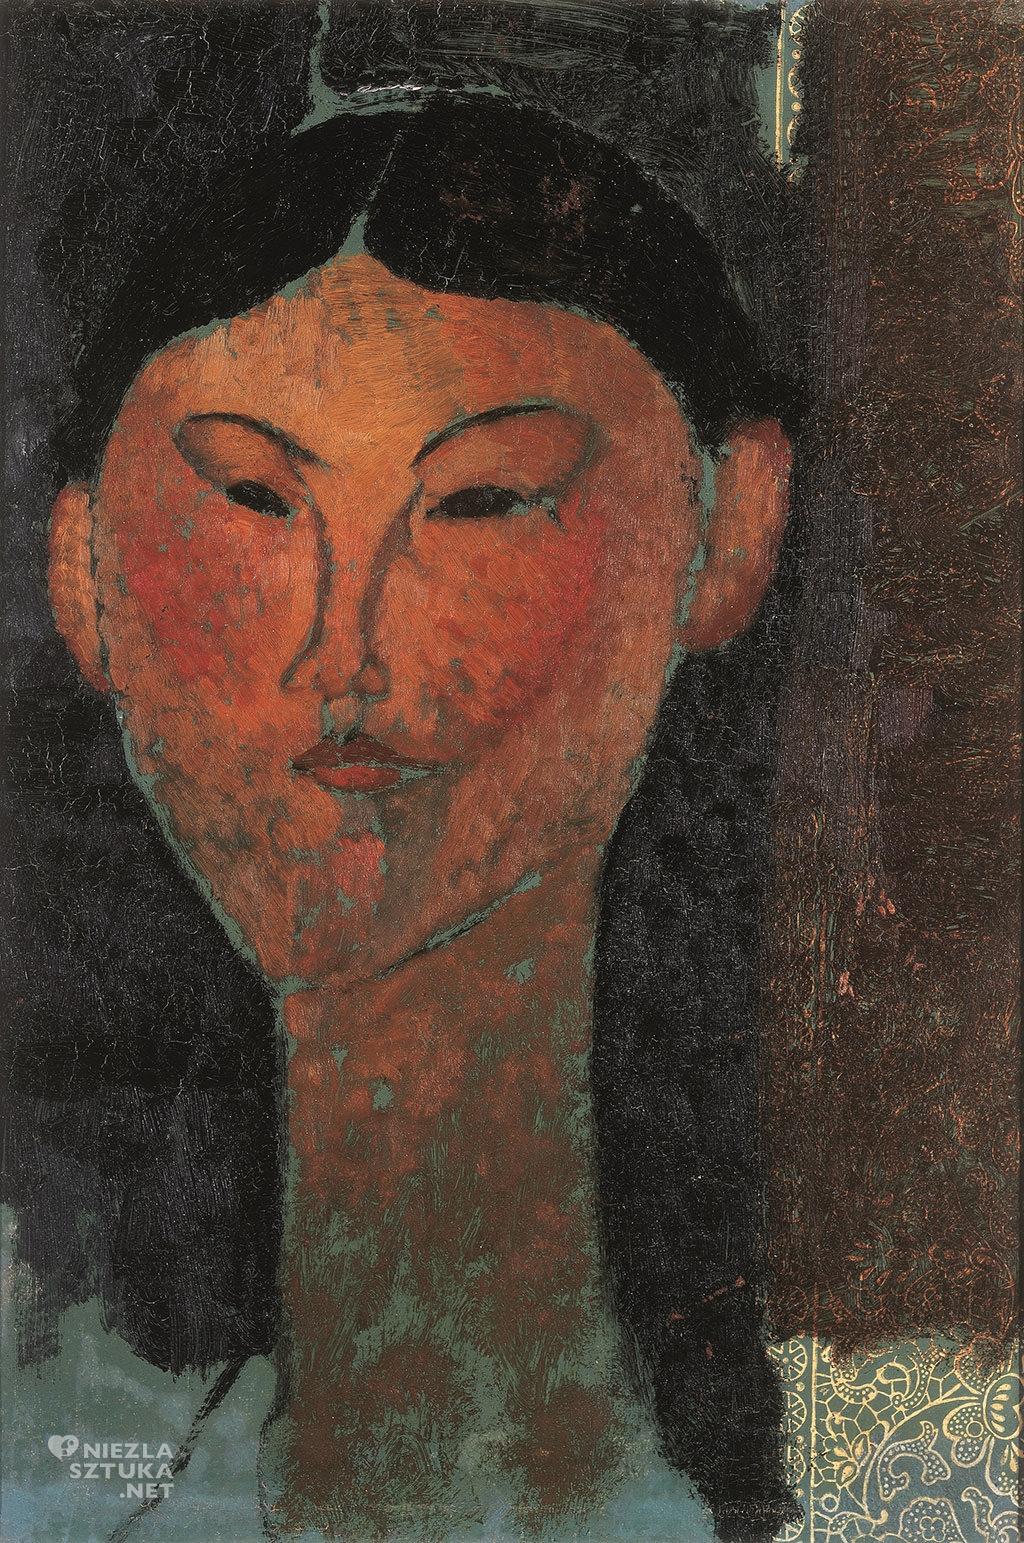 Amedeo Modigliani, Beatrice Hastings, malarstwo olejne, portret, sztuka włoska, sztuka nowoczesna, Ecole de Paris, Niezła Sztuka